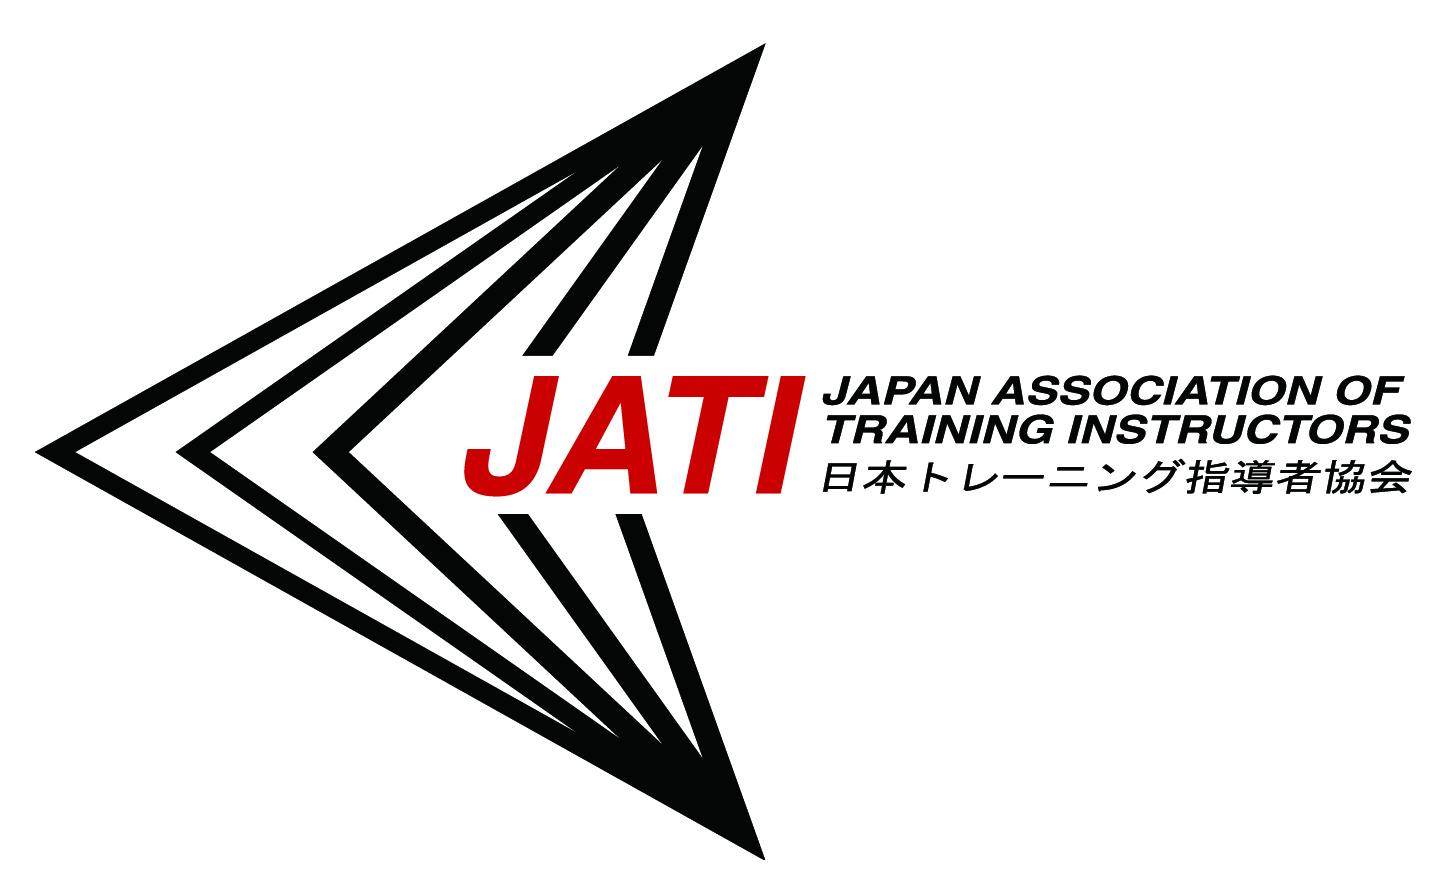 特定非営利活動法人日本トレーニング指導者協会